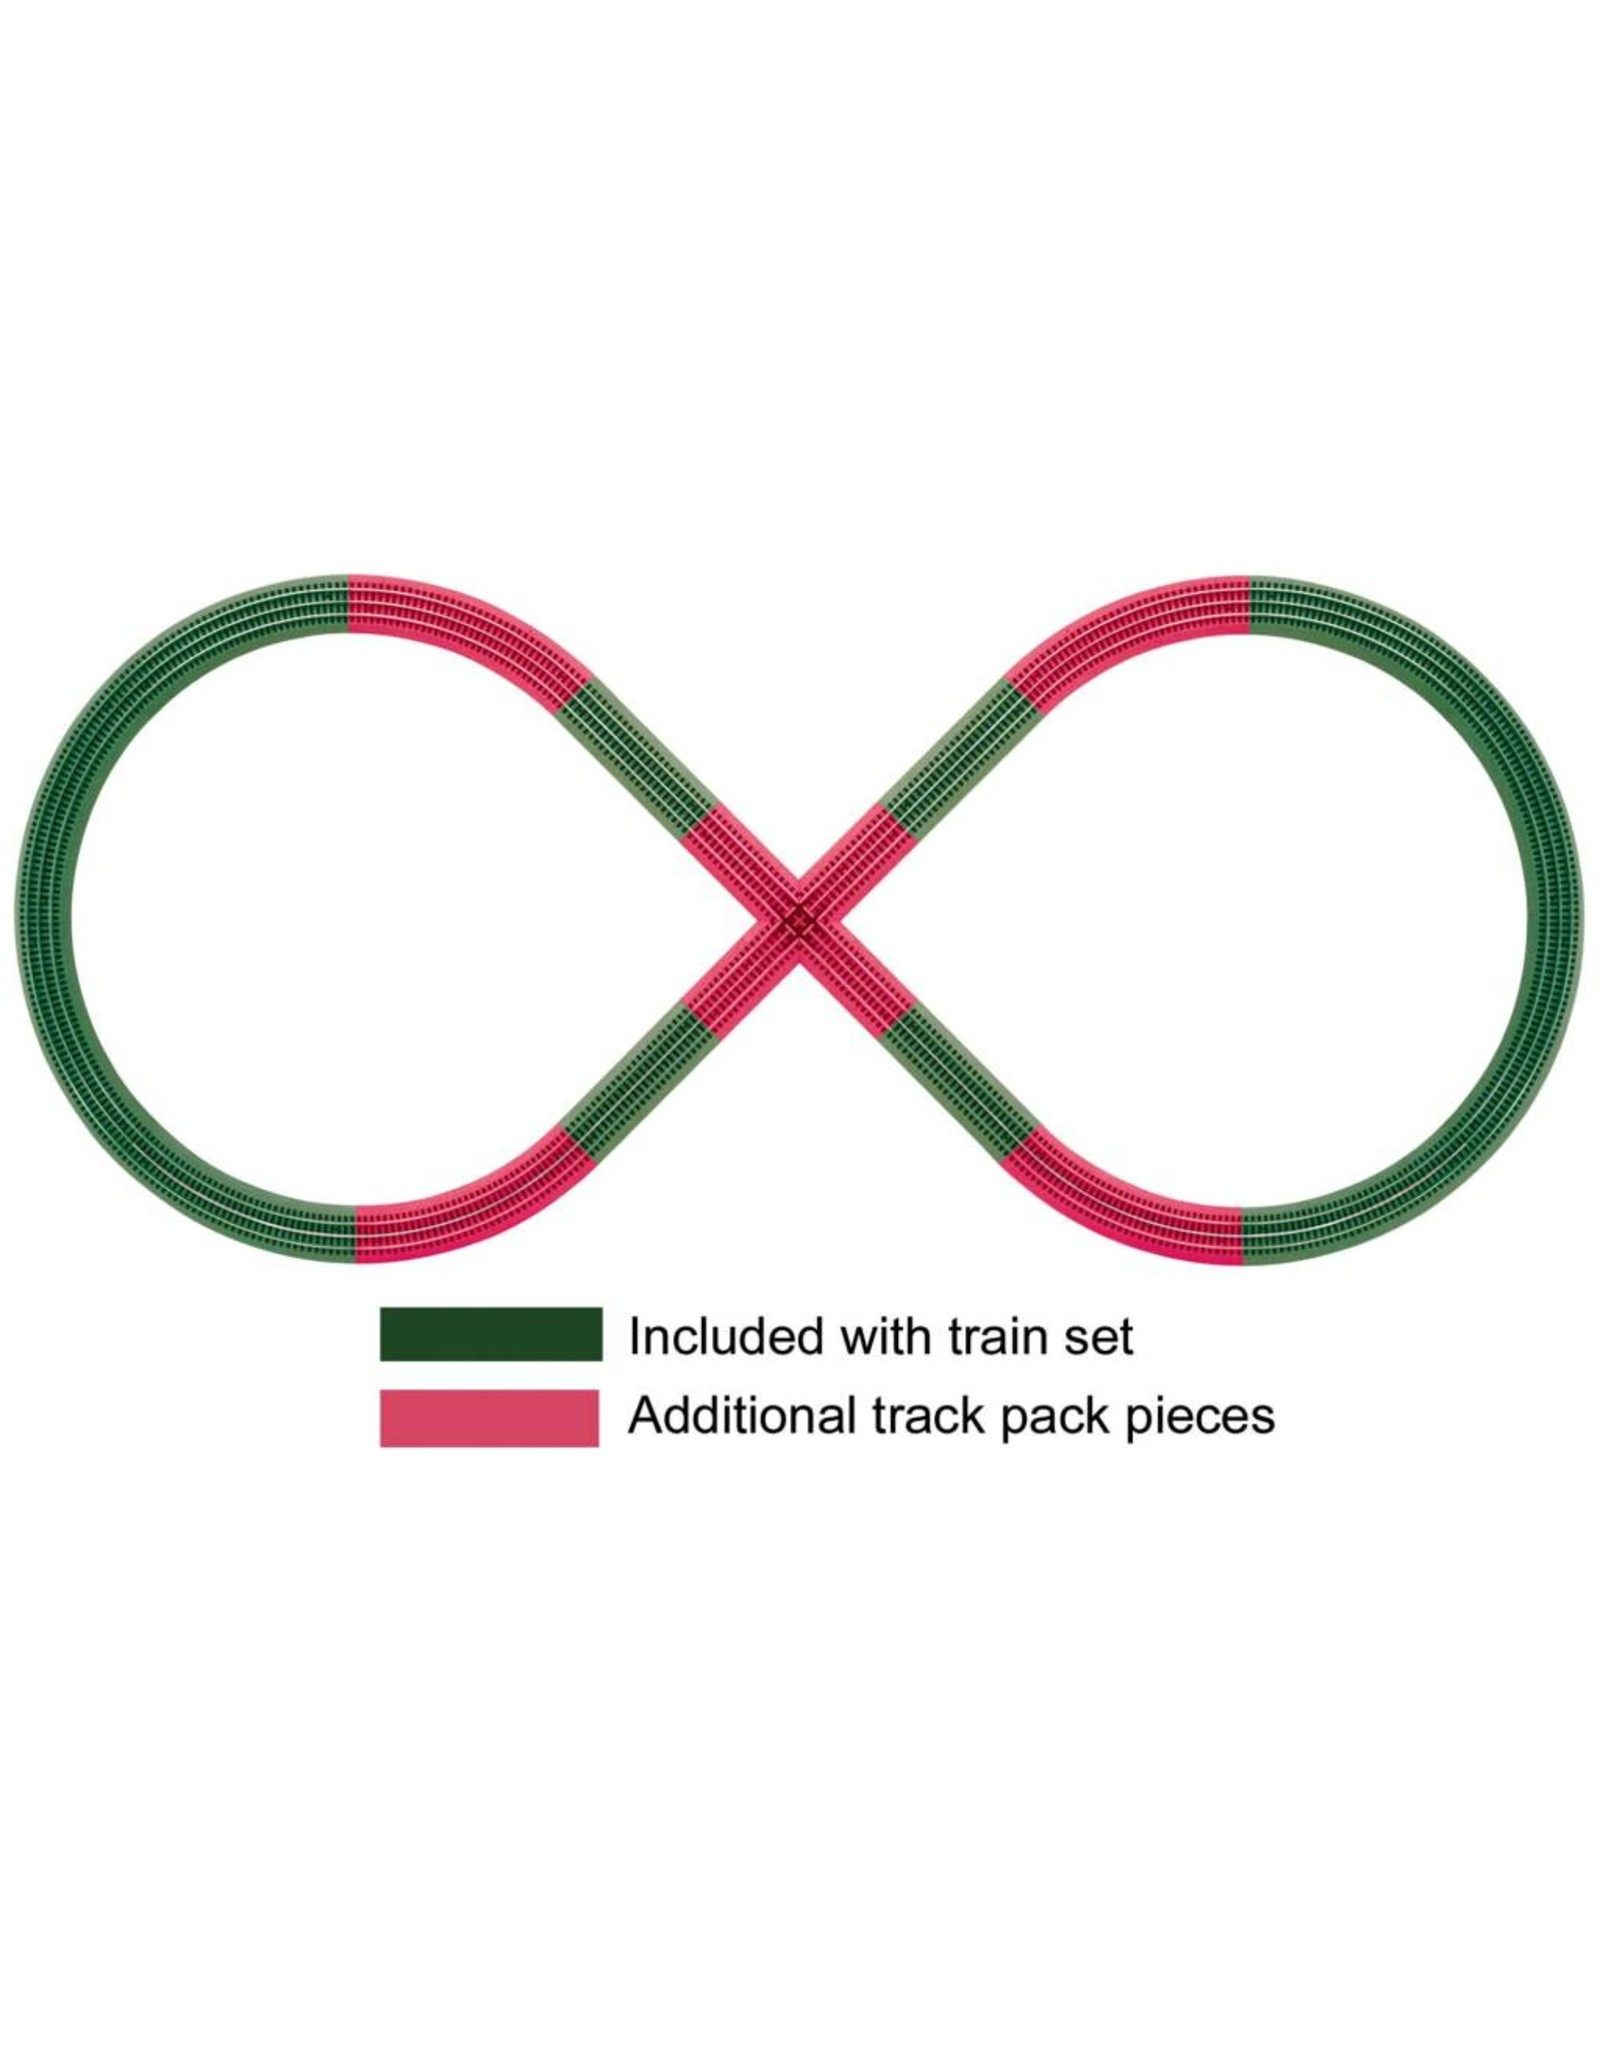 Lionel FasTrack - Figure-8 Track Pack